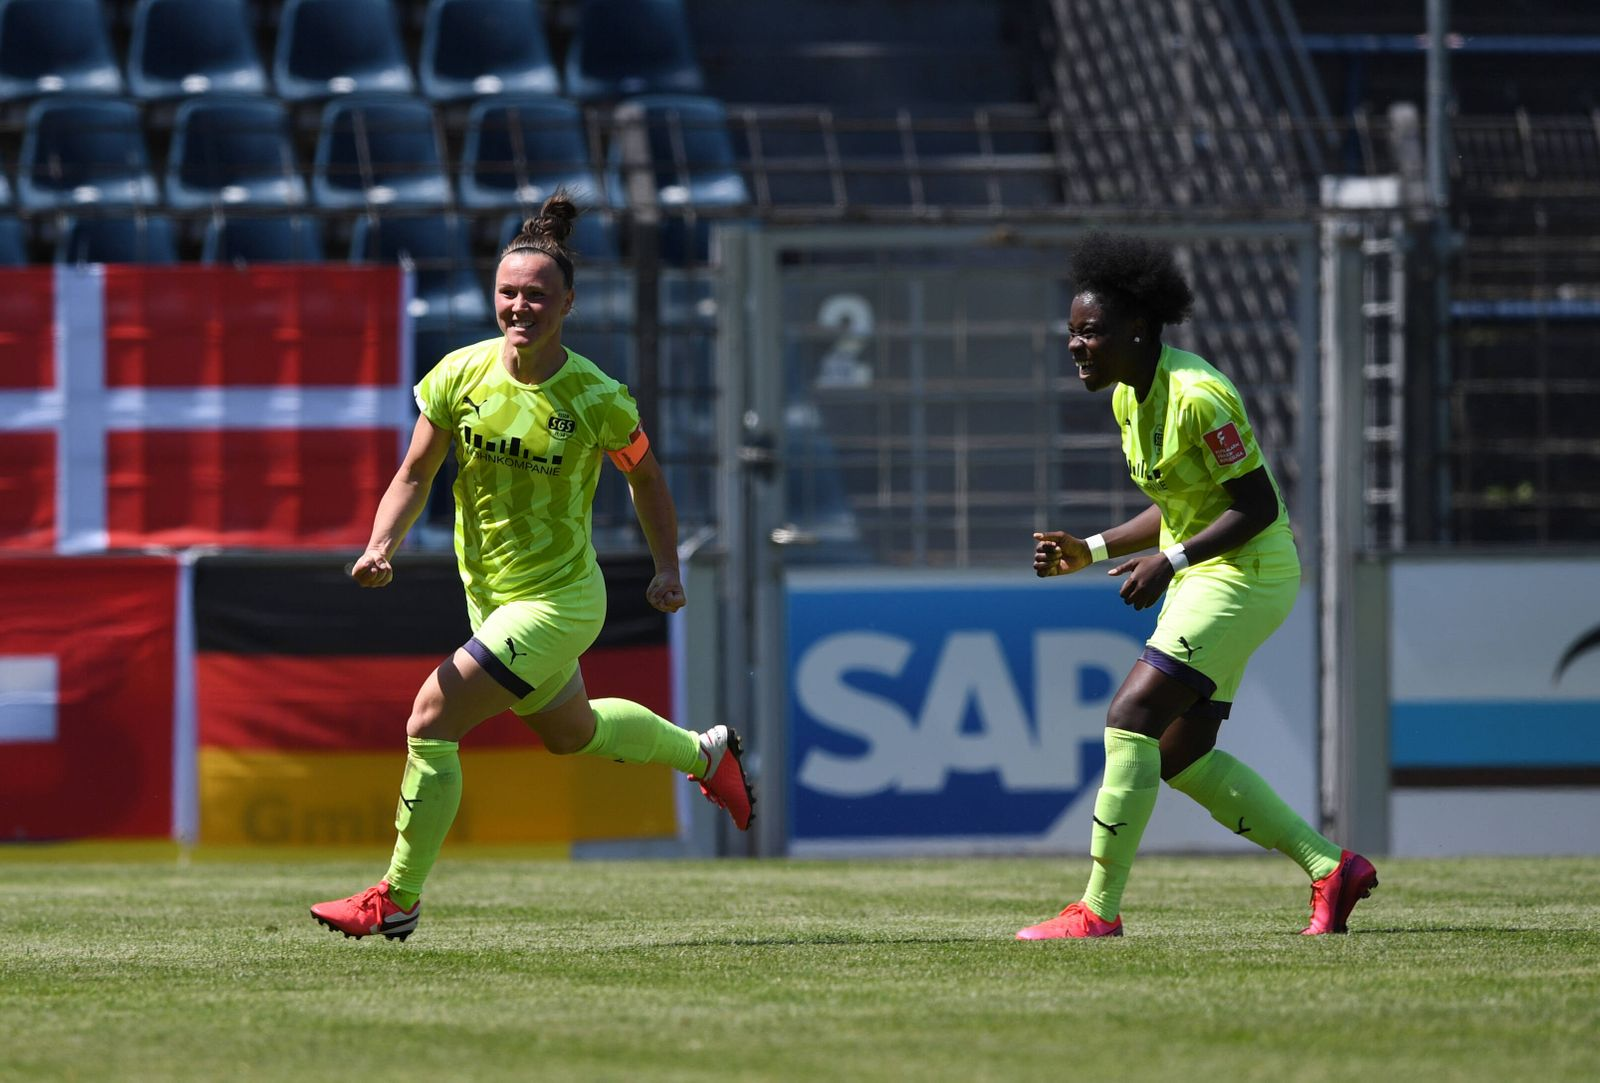 Fussball, Frauen, Saison 2019/2020, DFB-Pokal (Viertelfinale), 1. FFC Turbine Potsdam - SGS Essen, Marina Hegering (SGS